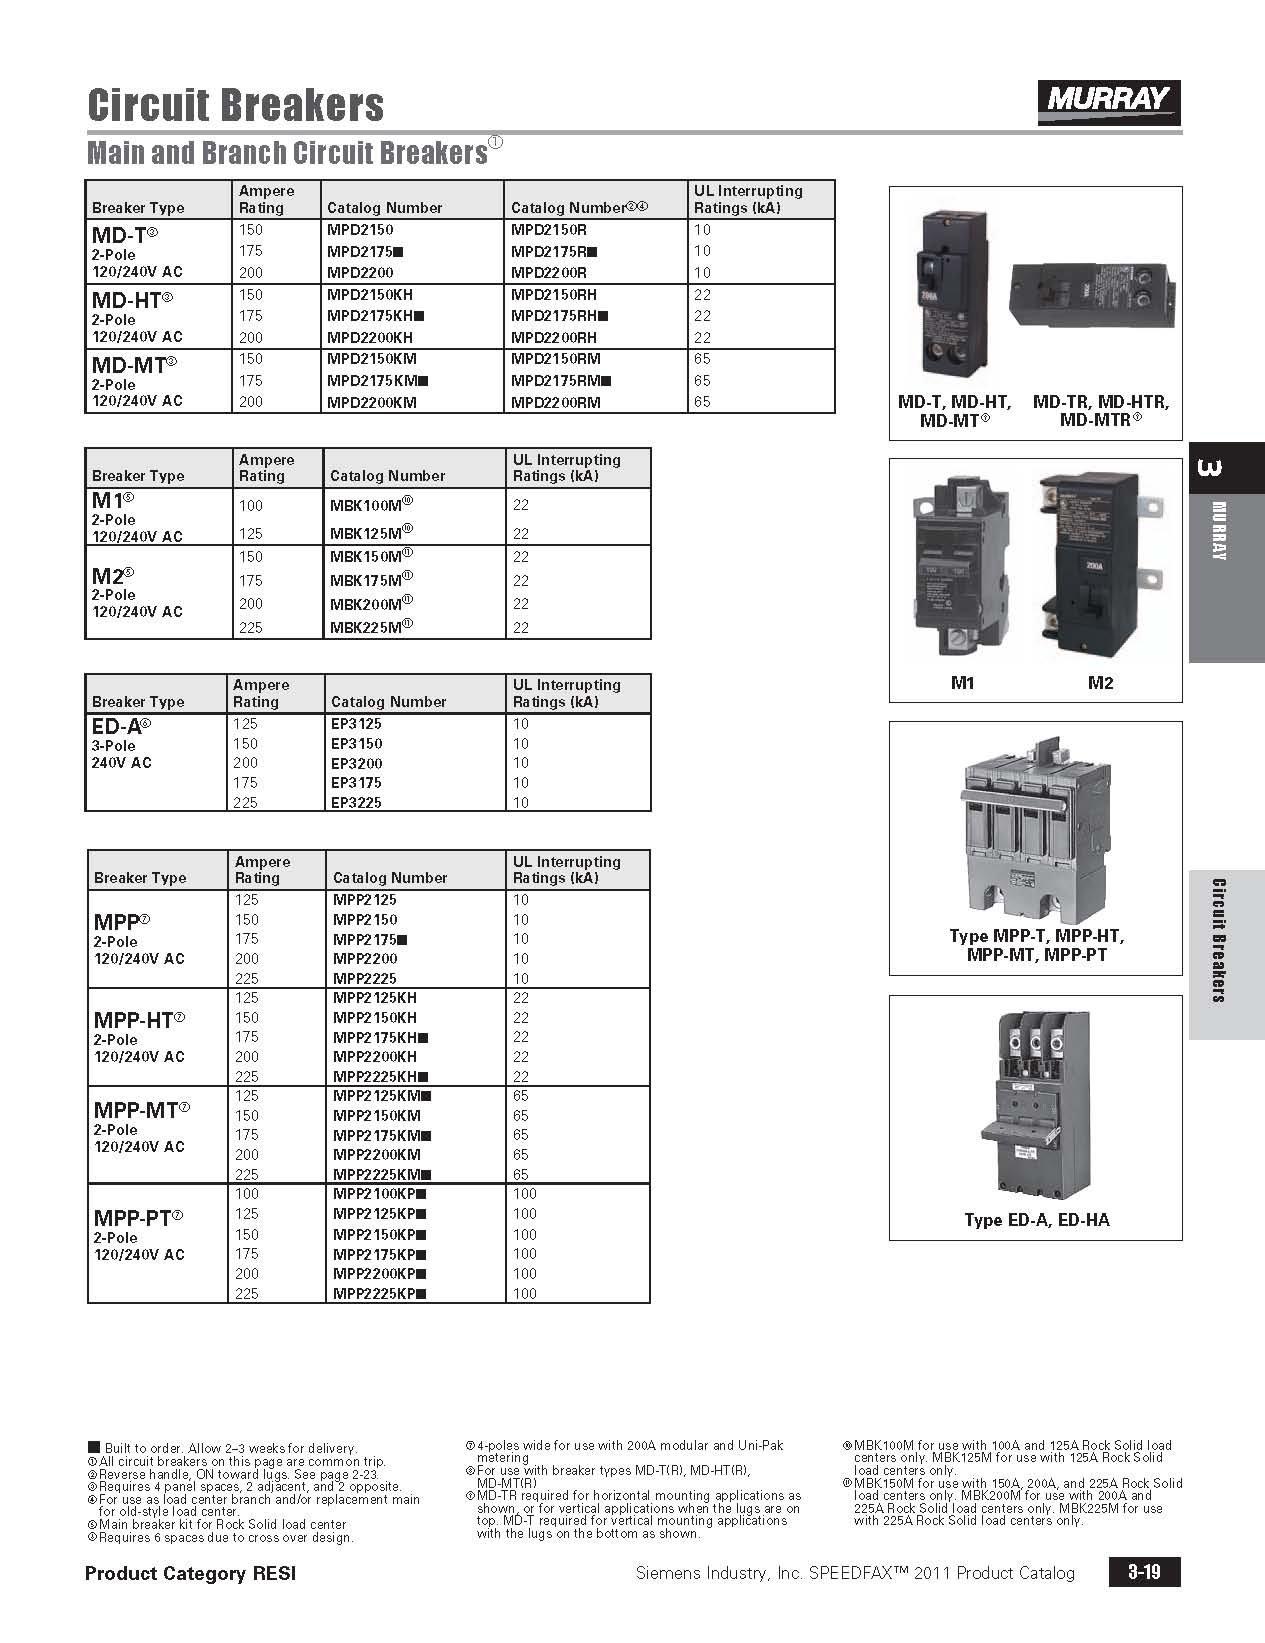 Murray MPD2150 150-Amp 2 Pole 240-Volt Circuit Breaker